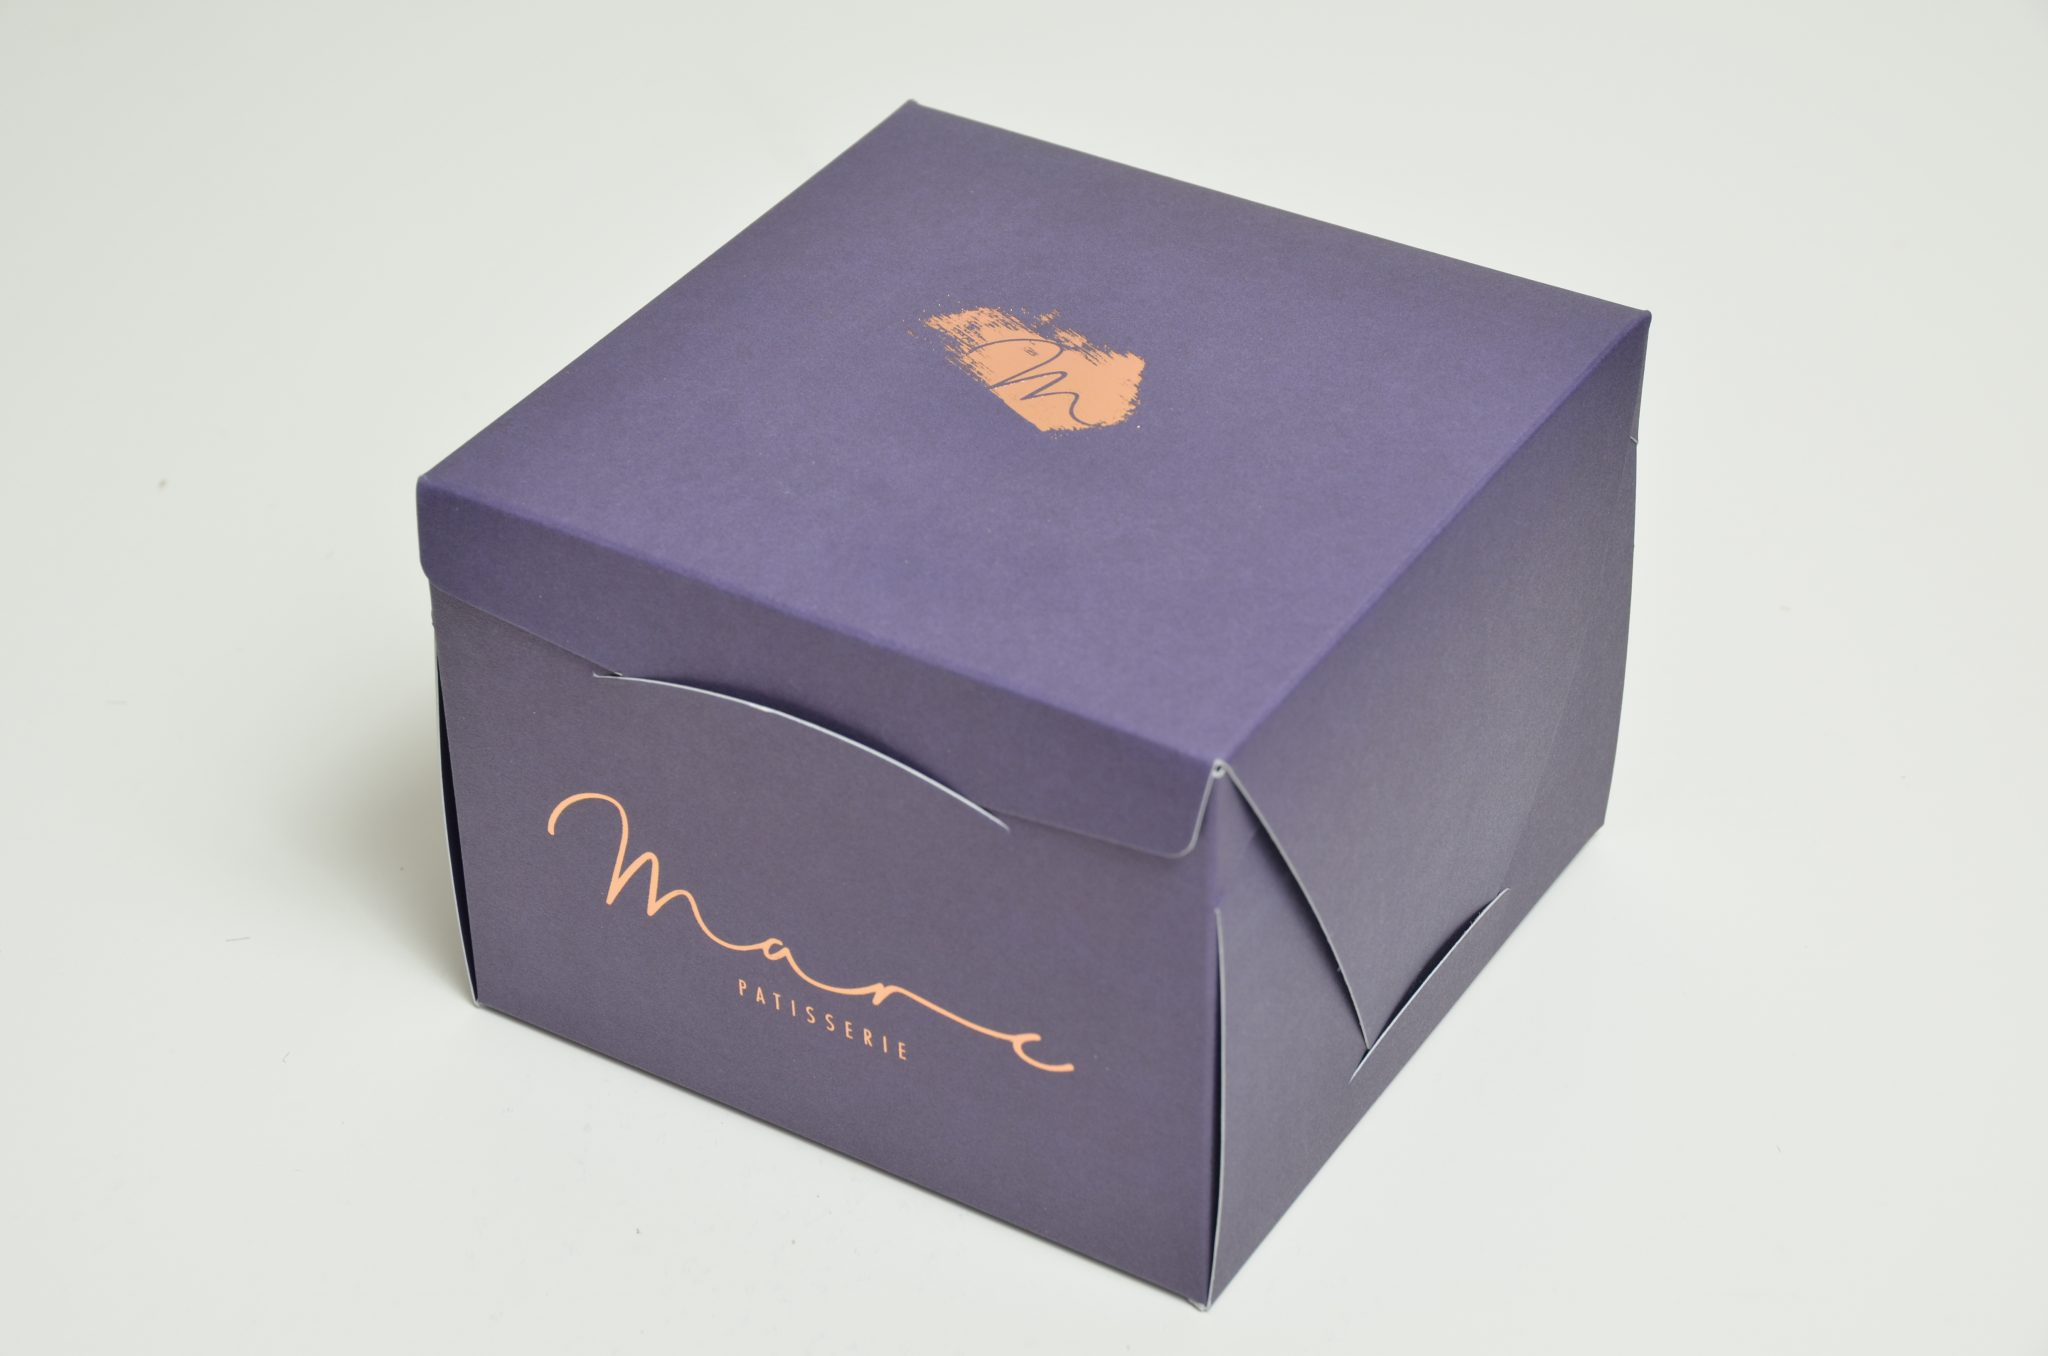 Large Bespoke Printed & Foiled Cake Box